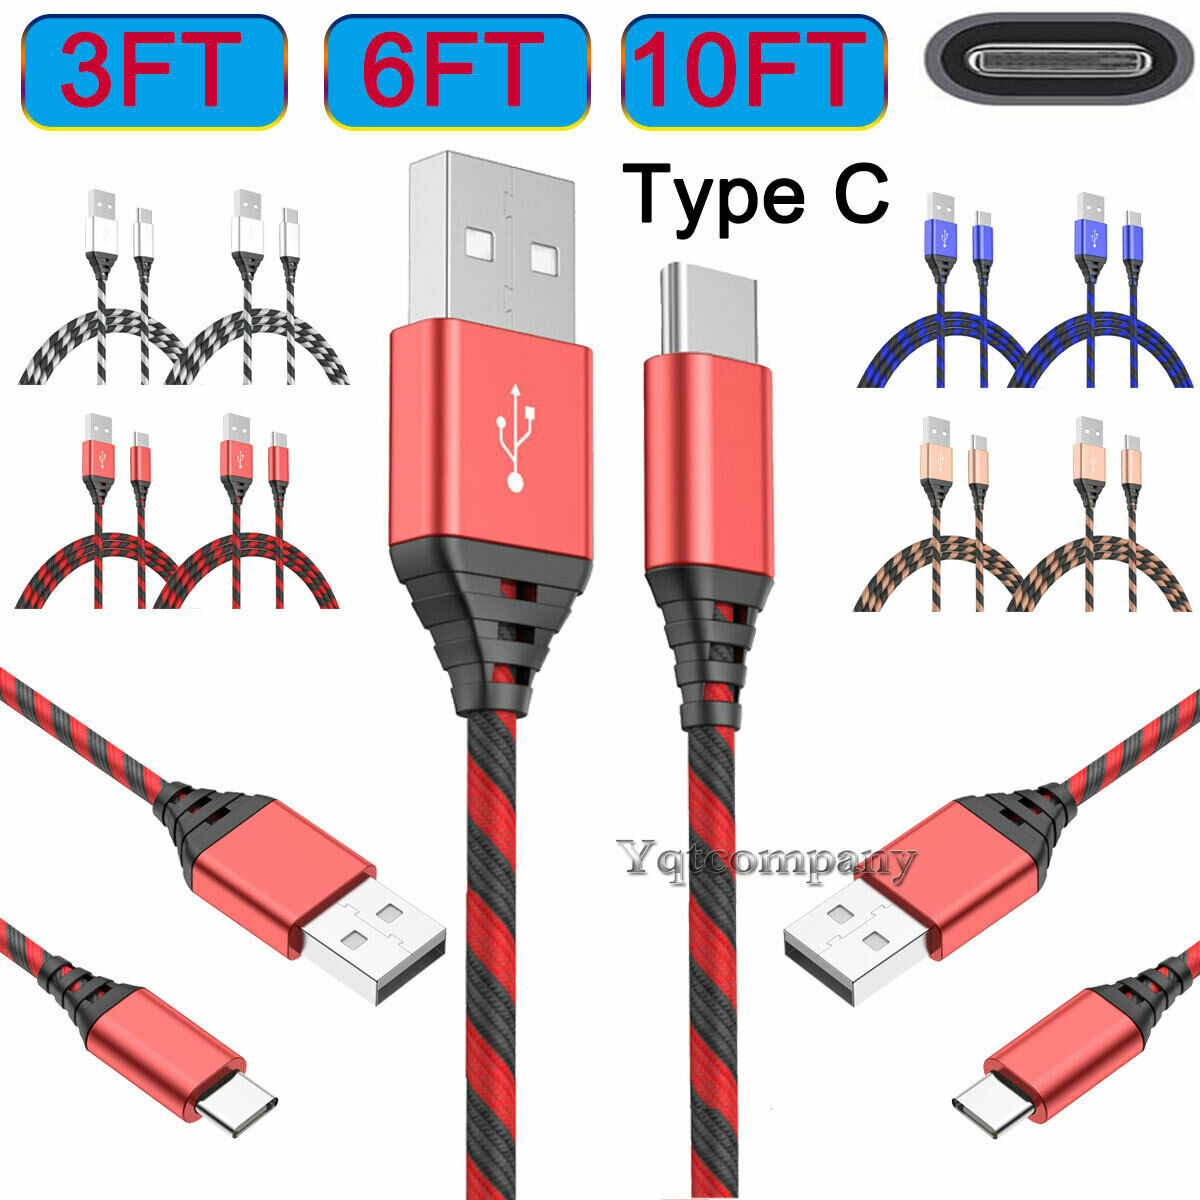 2-Pack Type C Charging Cable For LG Stylo 5 4 Plus V20 V30 V40 G5 G6 G7 G8 ThinQ